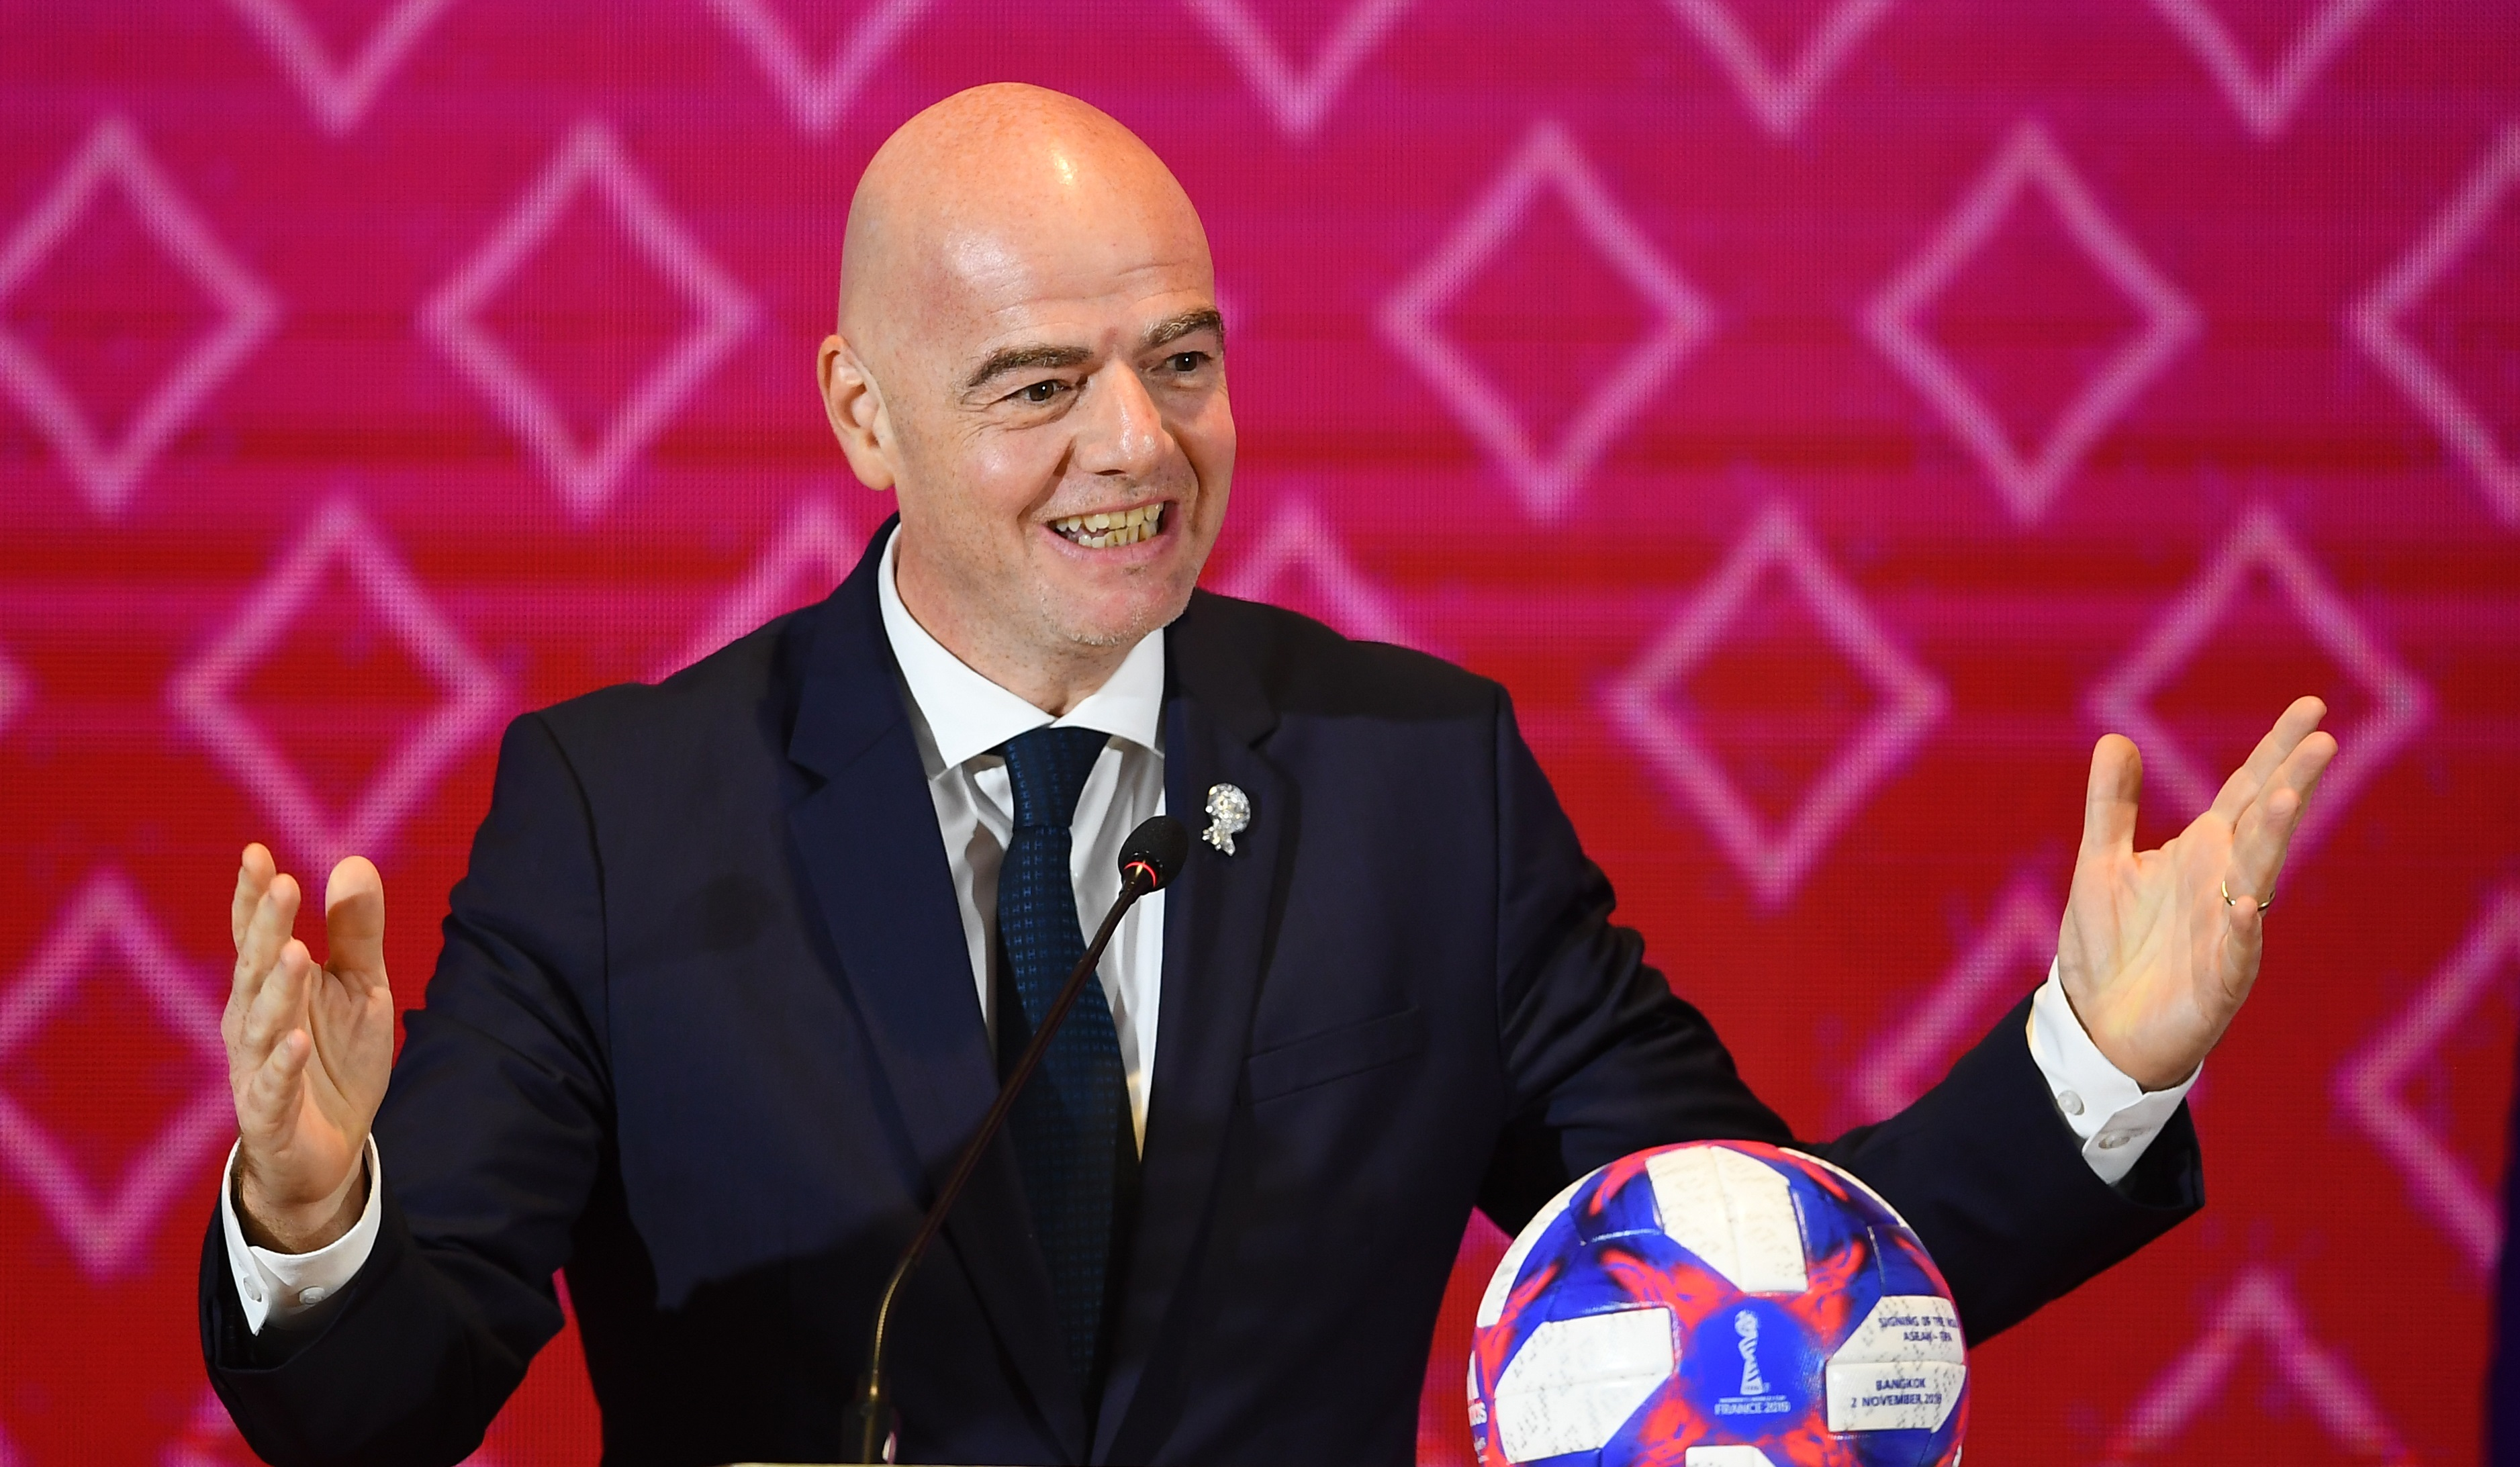 La justice interne de la Fifa classe l'affaire Infantino